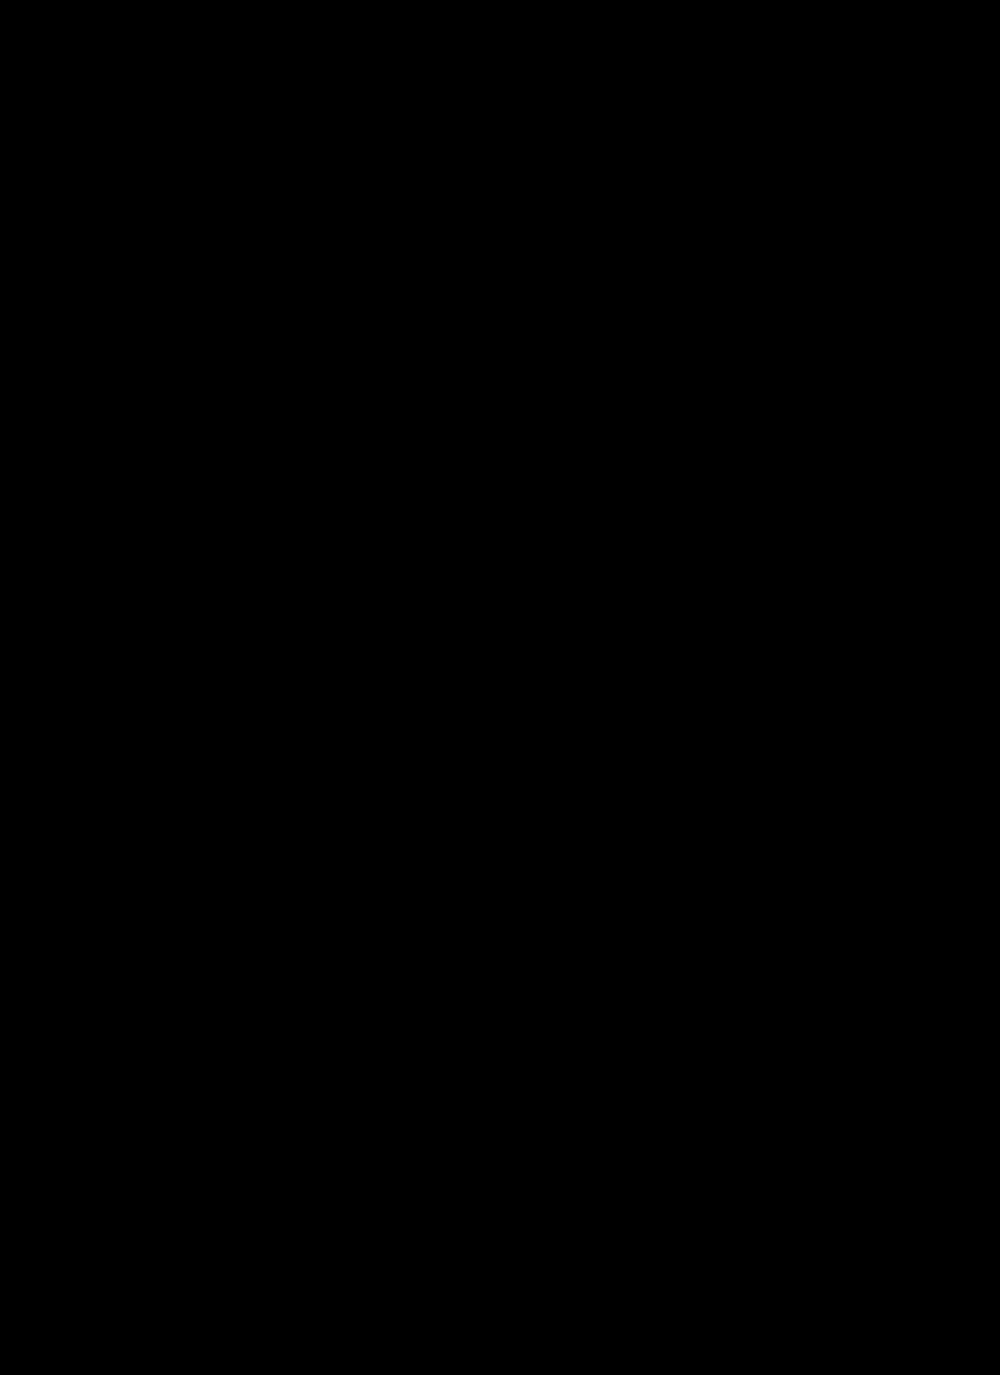 lic-005